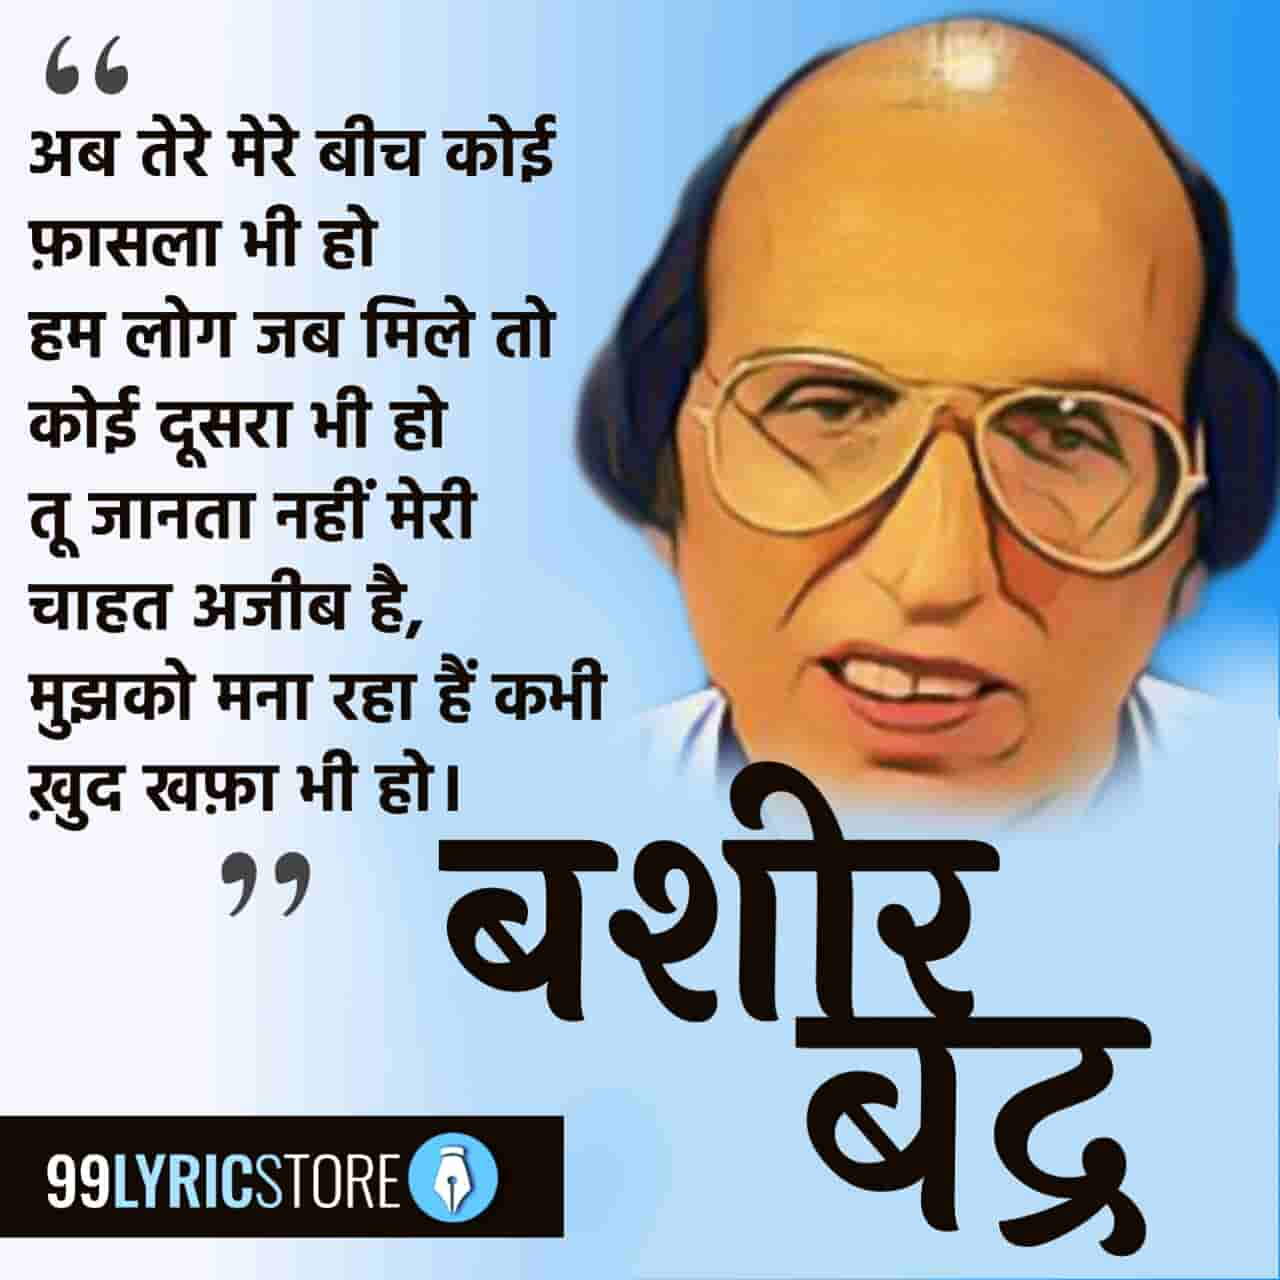 This beautiful ghazal 'Ab Tere Mere Beech Koi Faasla Bhi Ho' has written by Bashir Badr.